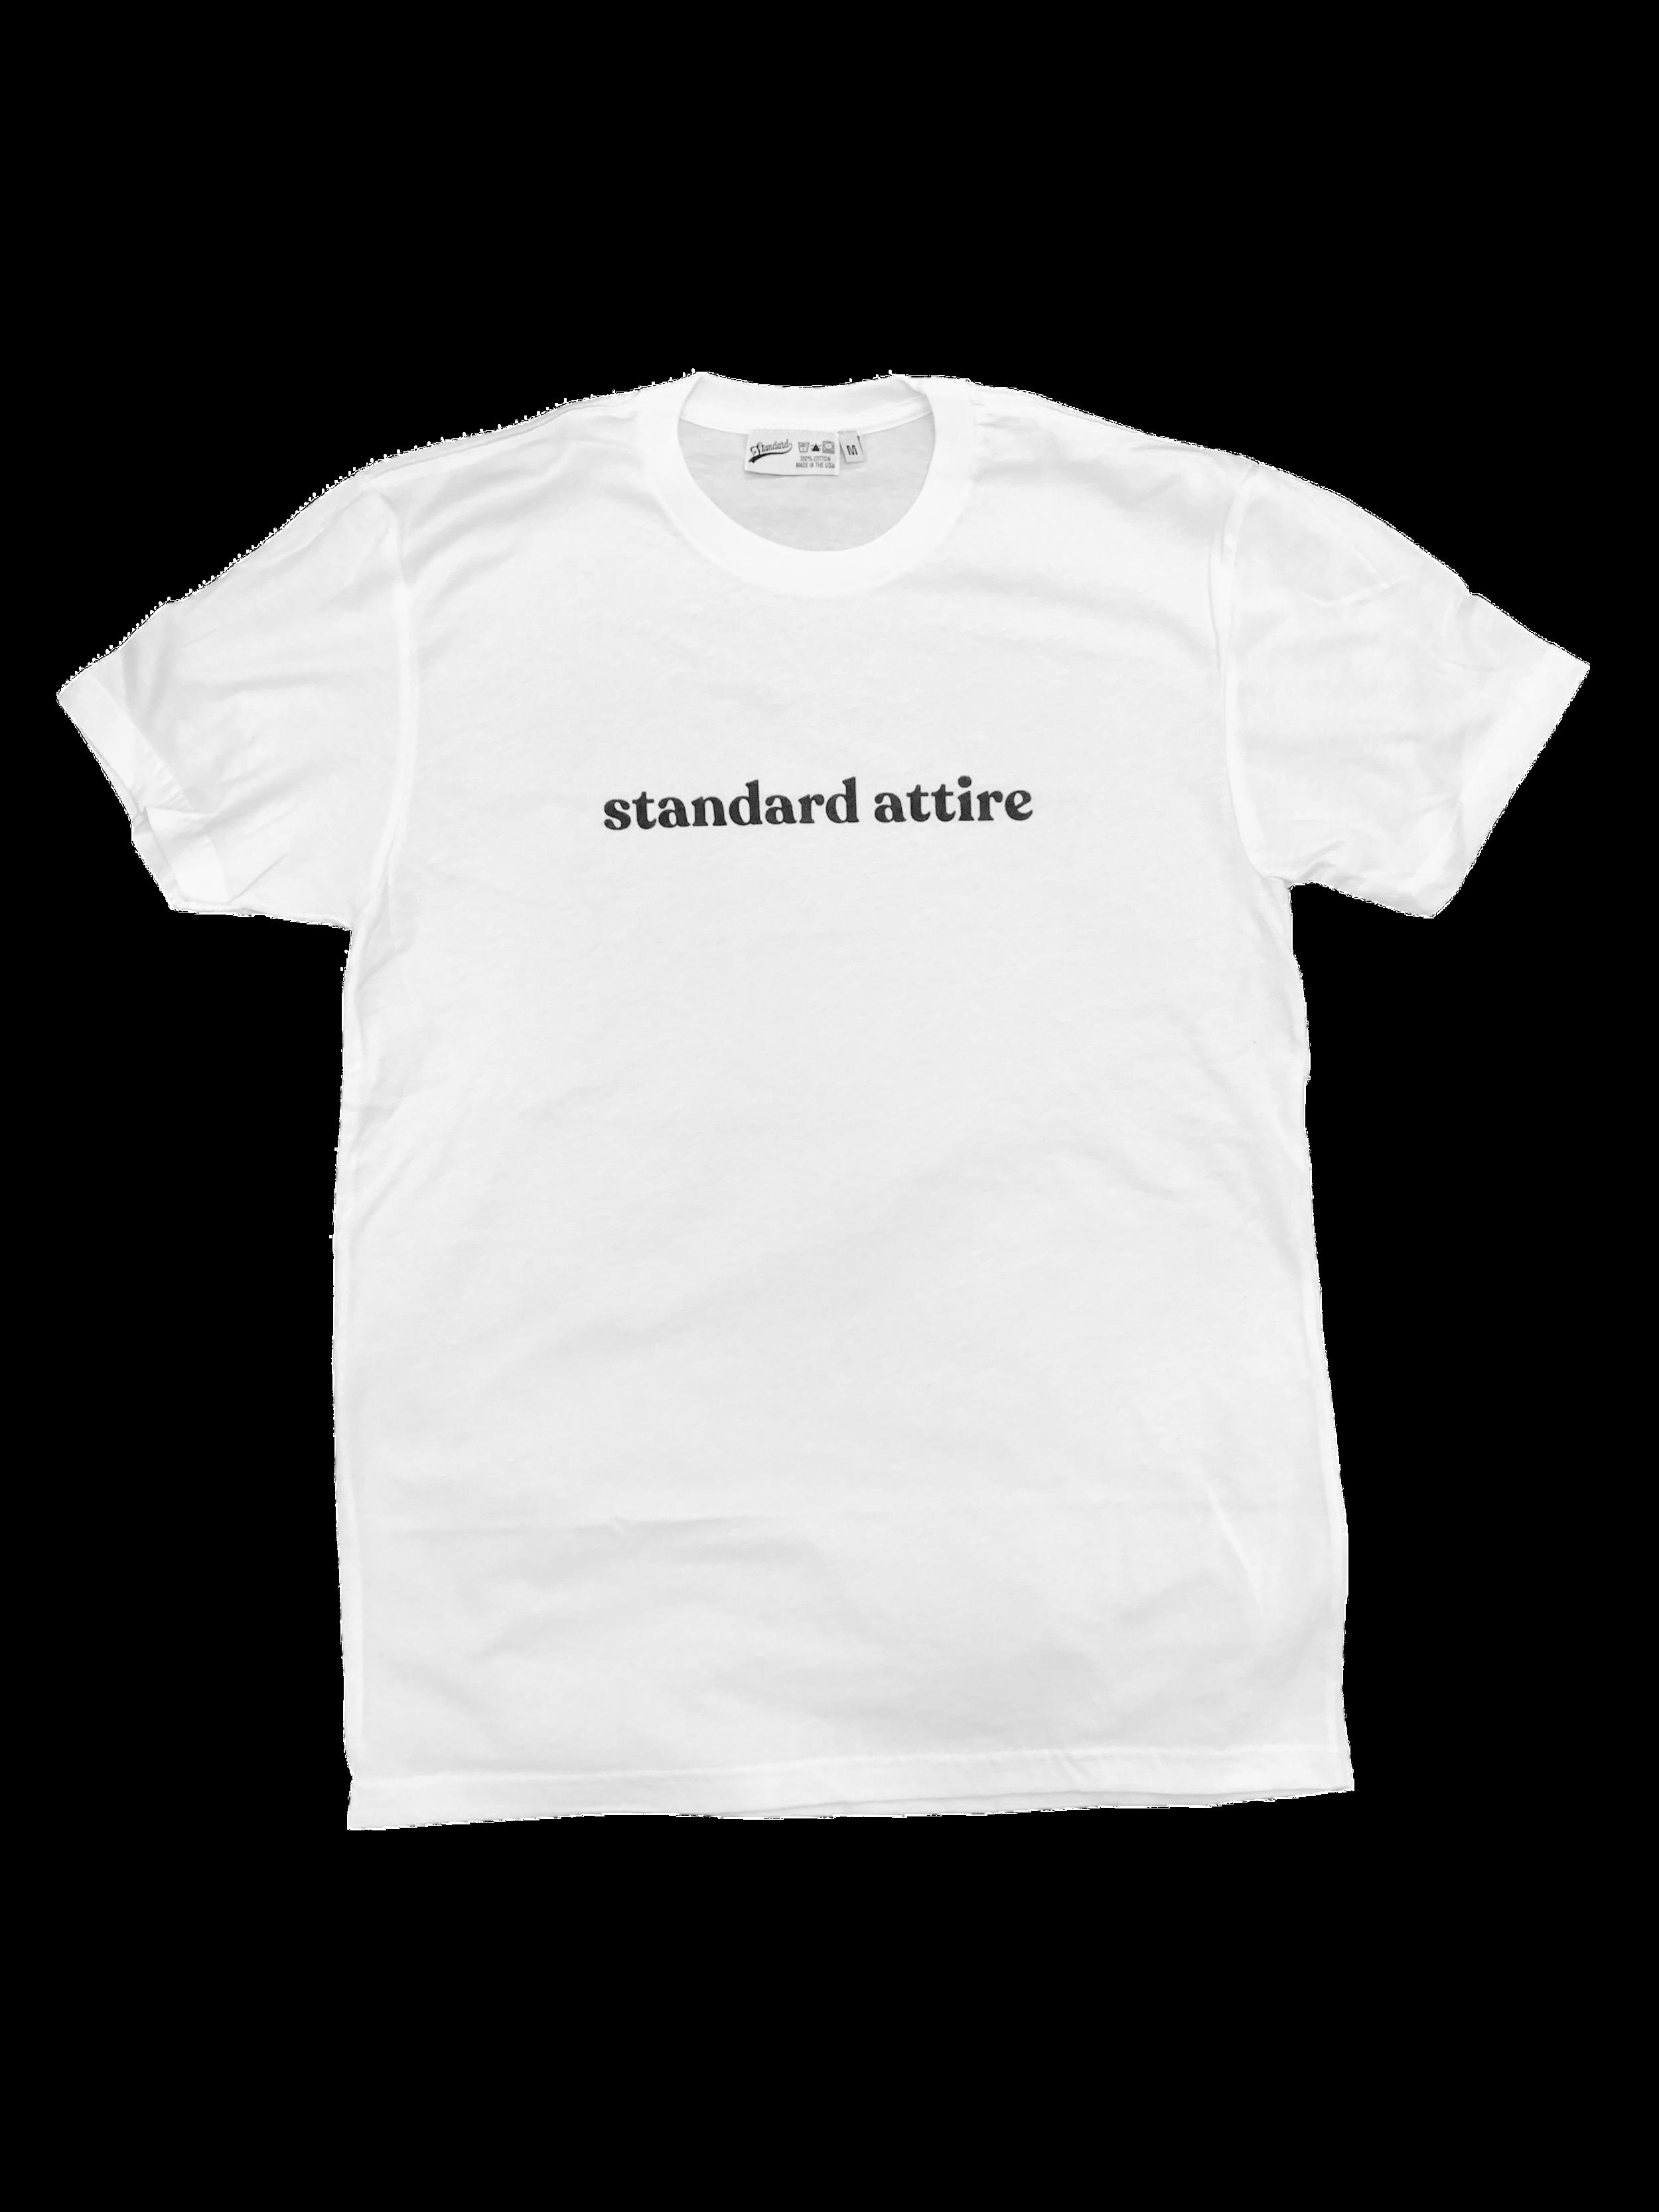 standard attire